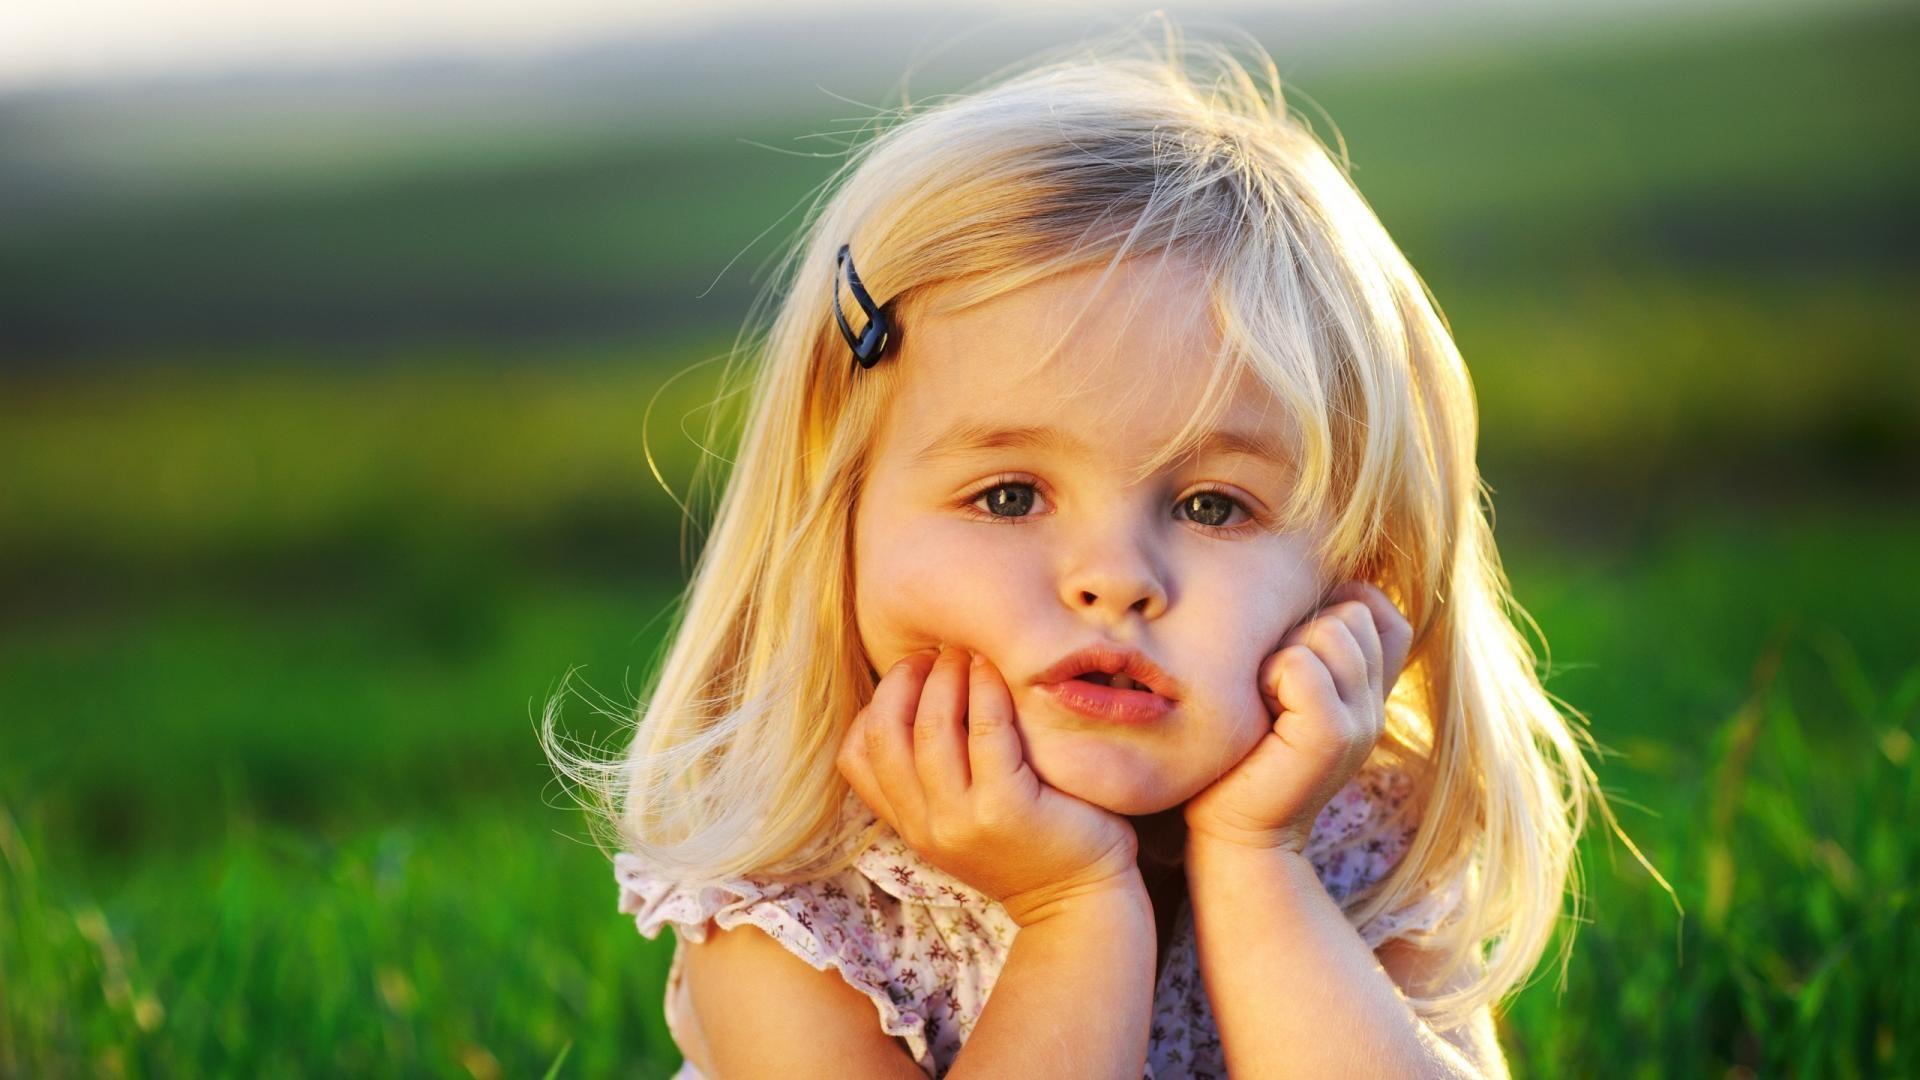 cute little baby girl hd wallpaper of baby - hdwallpaper2013